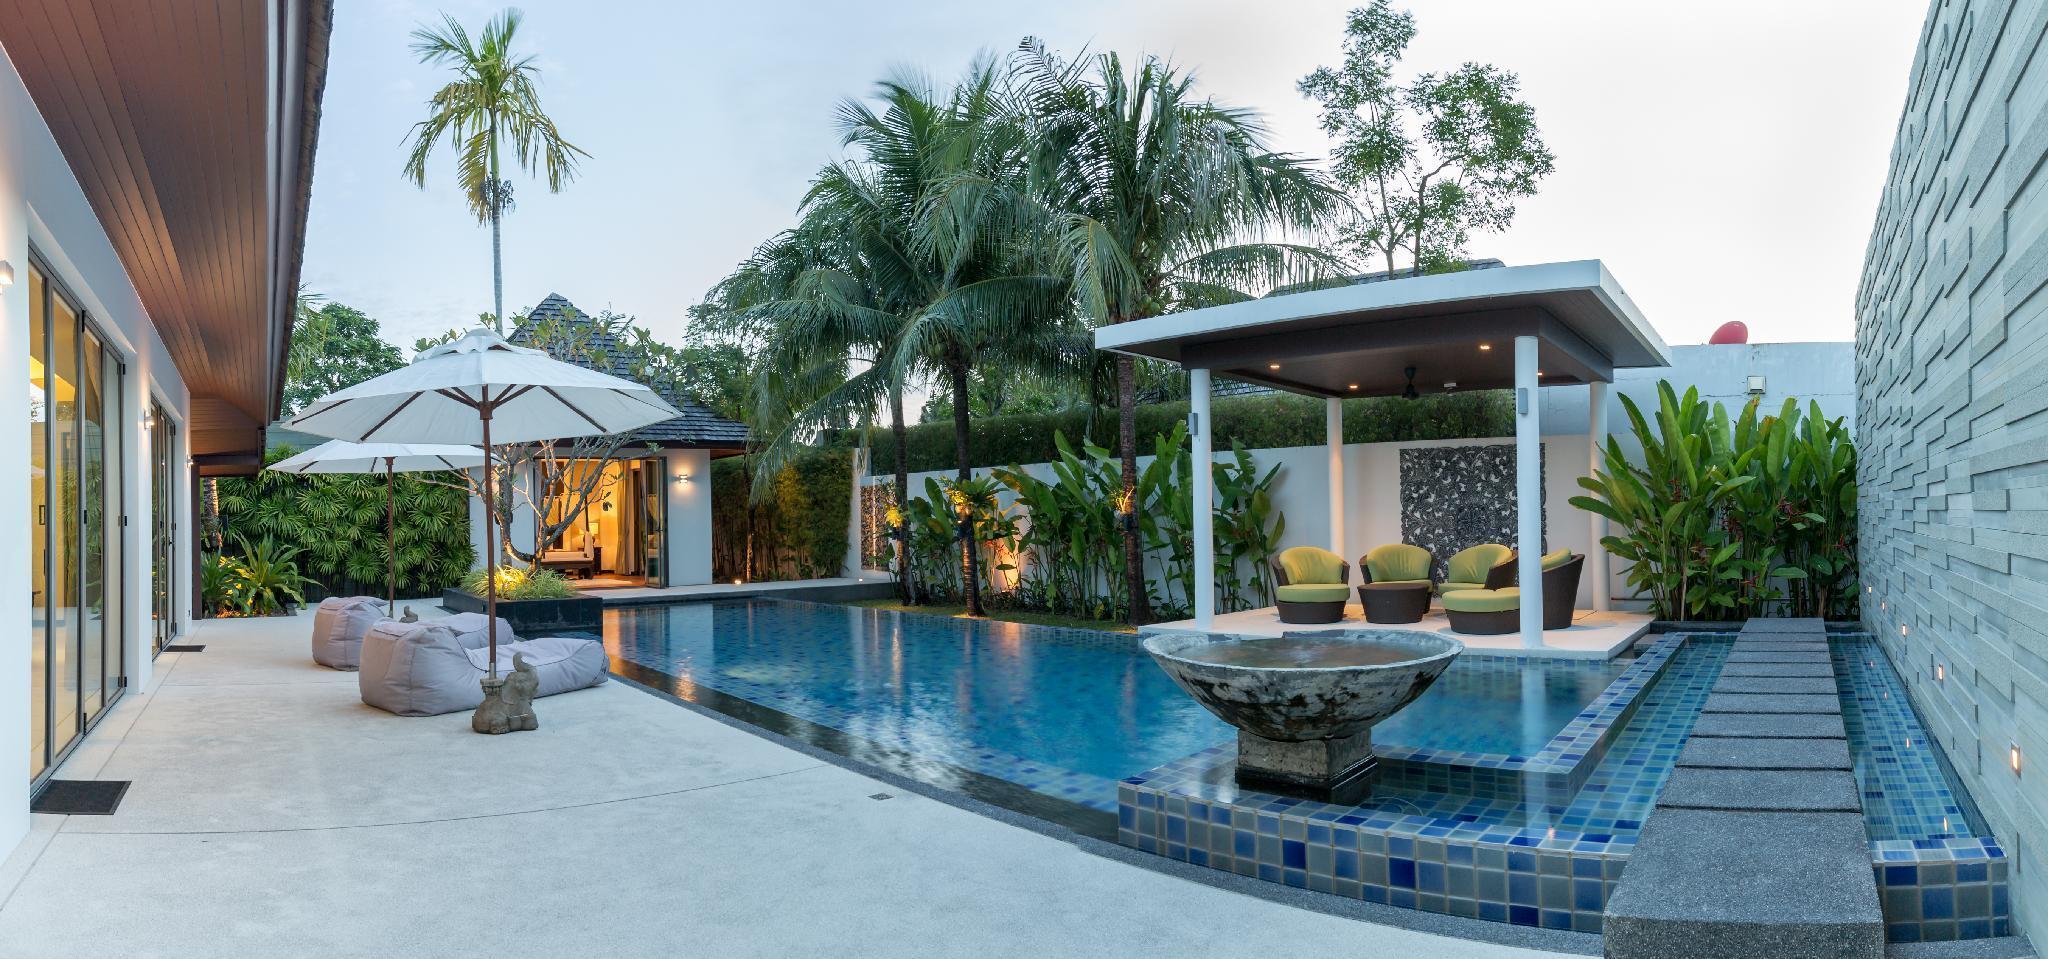 4BDR VILLA bangtao beach huge discount  month stay วิลลา 4 ห้องนอน 4 ห้องน้ำส่วนตัว ขนาด 850 ตร.ม. – บางเทา